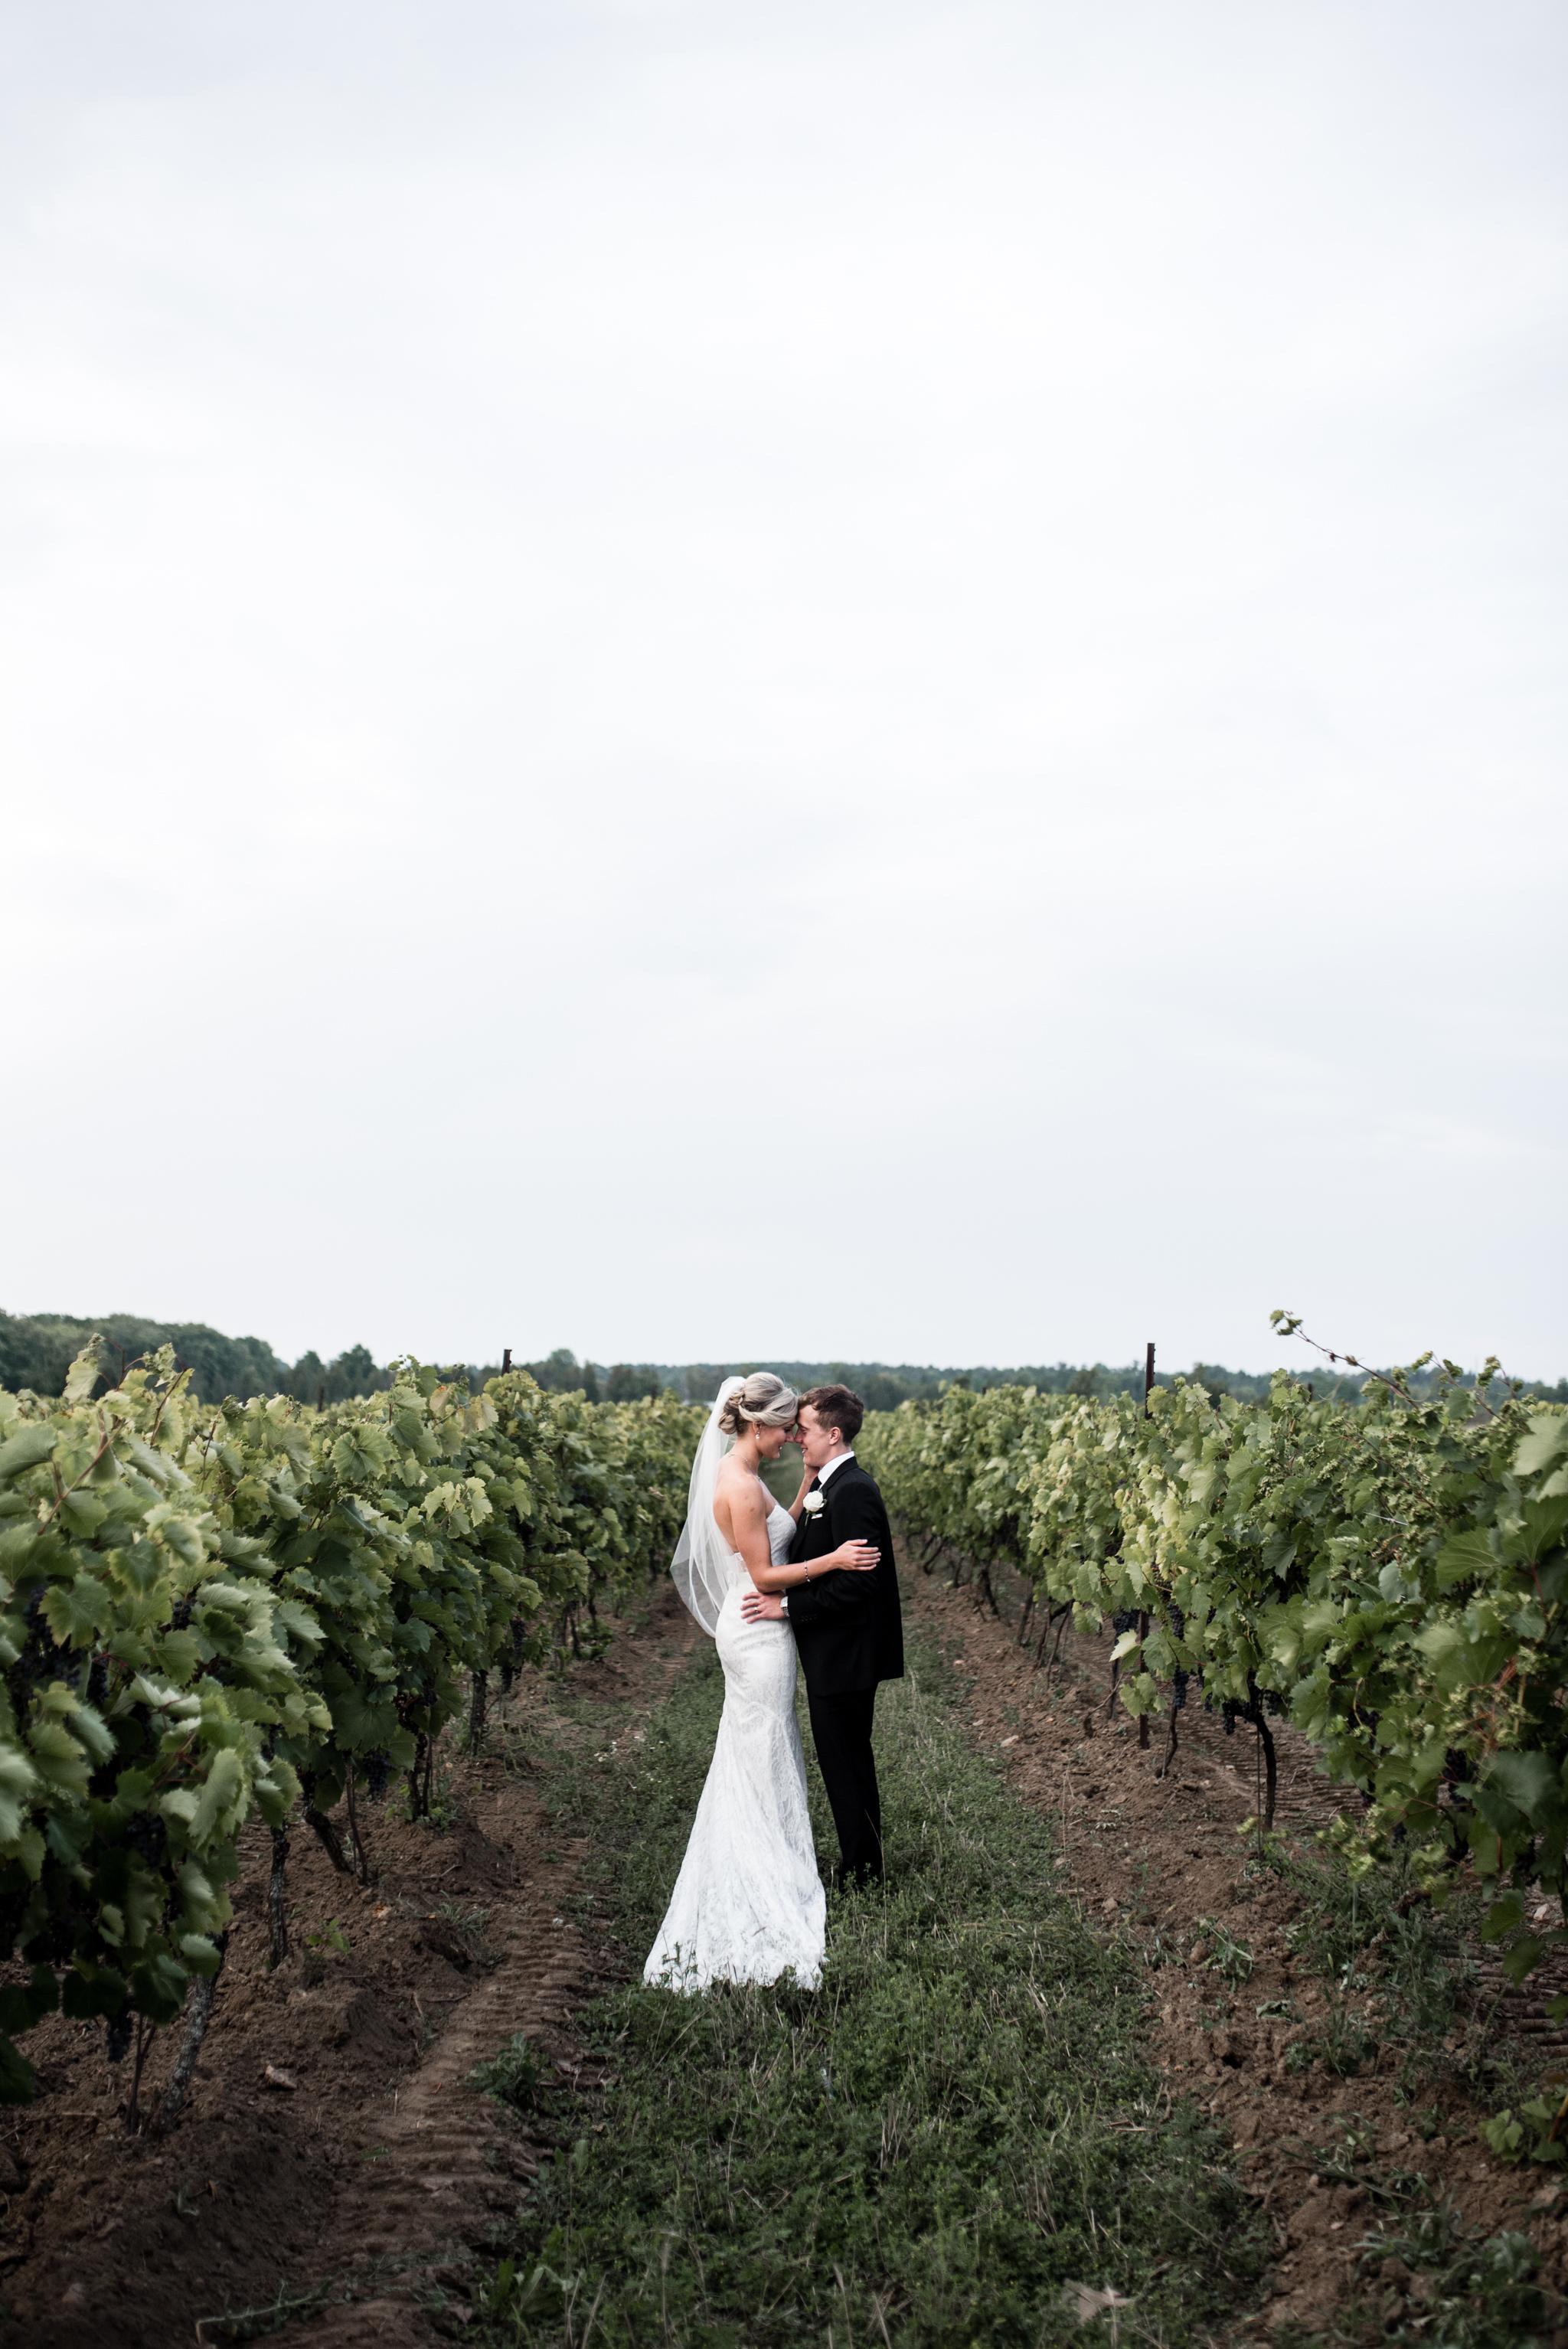 toronto-willow-spring-winery-wedding-photographer-65